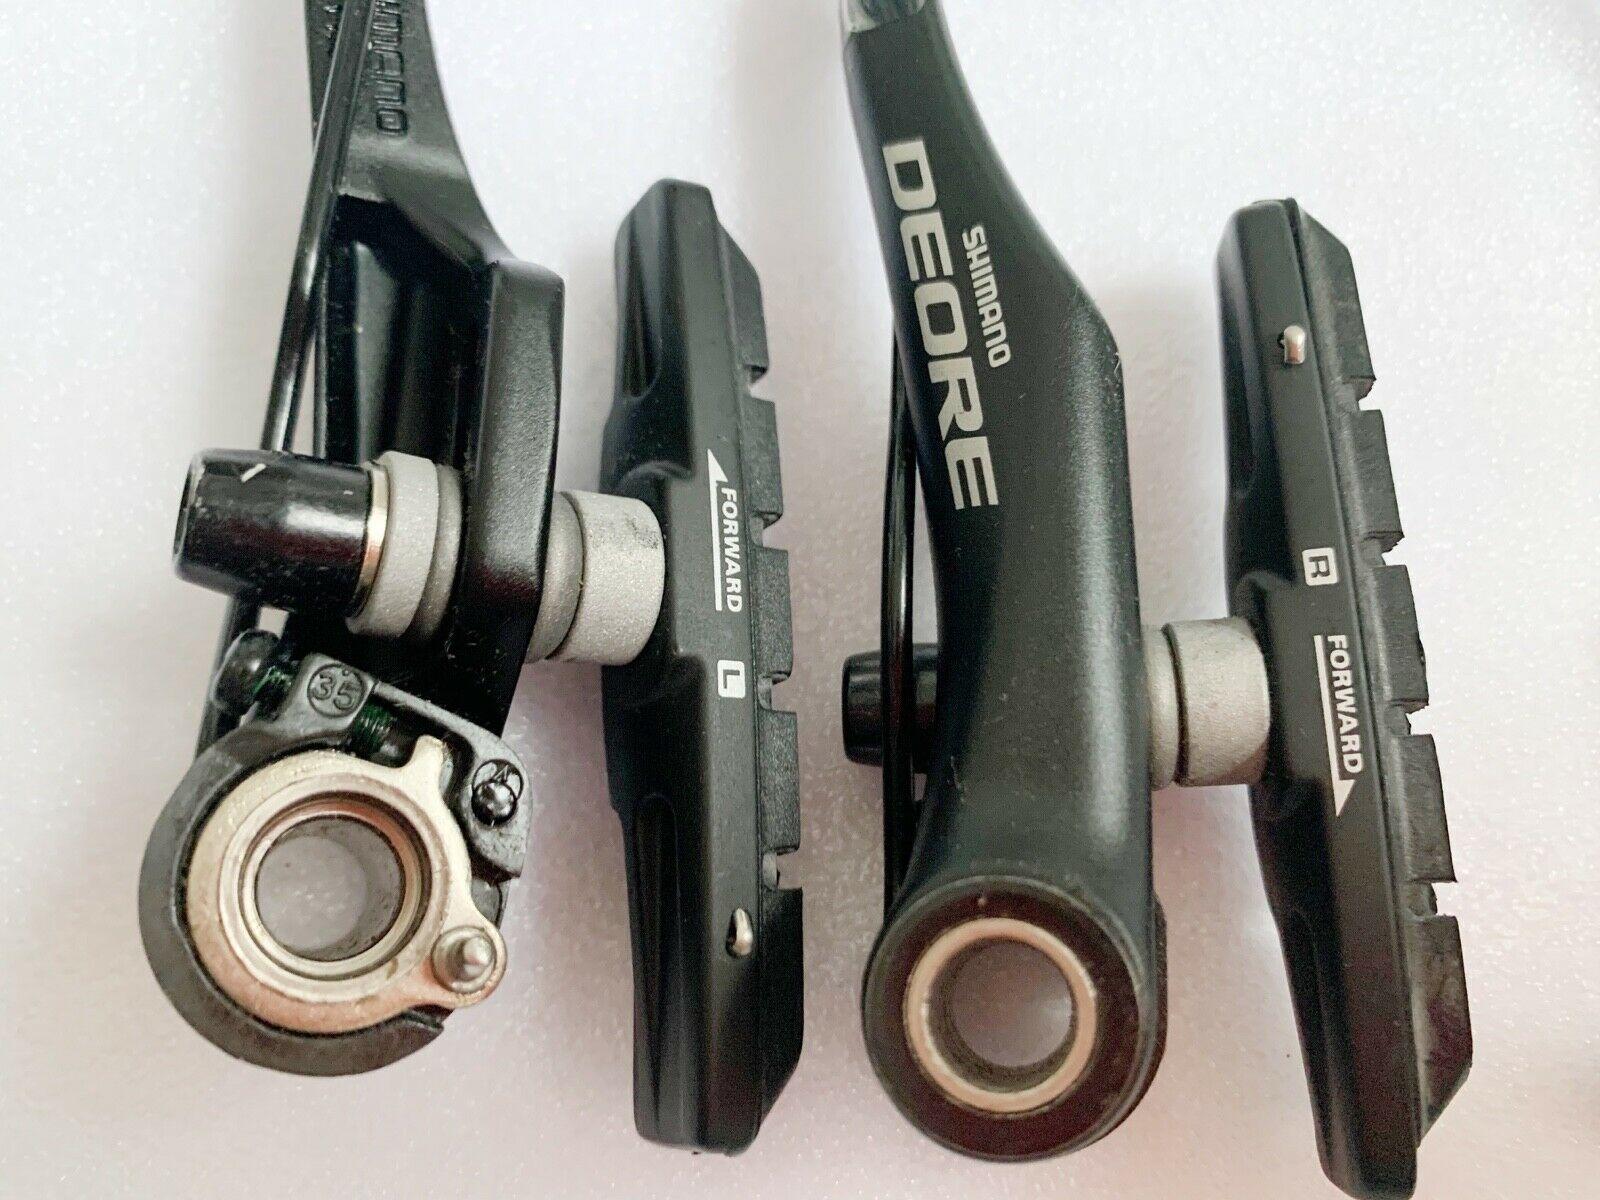 Shimano Deore BR-T610 Cycling Brakes Trekking MTB Front/&Rear V-Brake Sets US